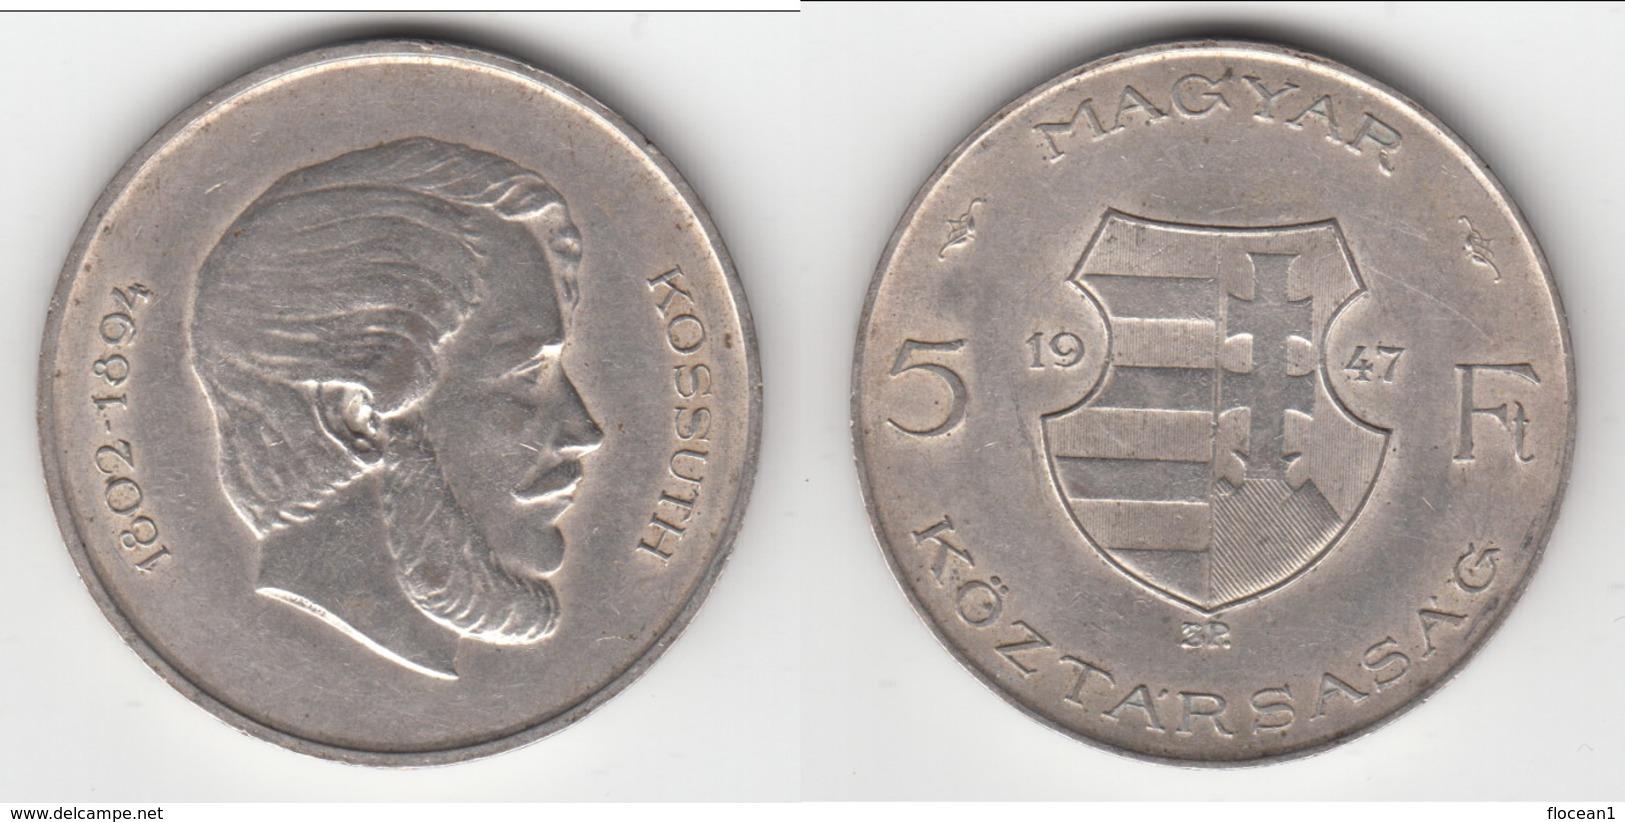 **** HONGRIE - HUNGARY - 5 FORINT 1947 KOSSUTH - ARGENT - SILVER **** EN ACHAT IMMEDIAT !!! - Hungary